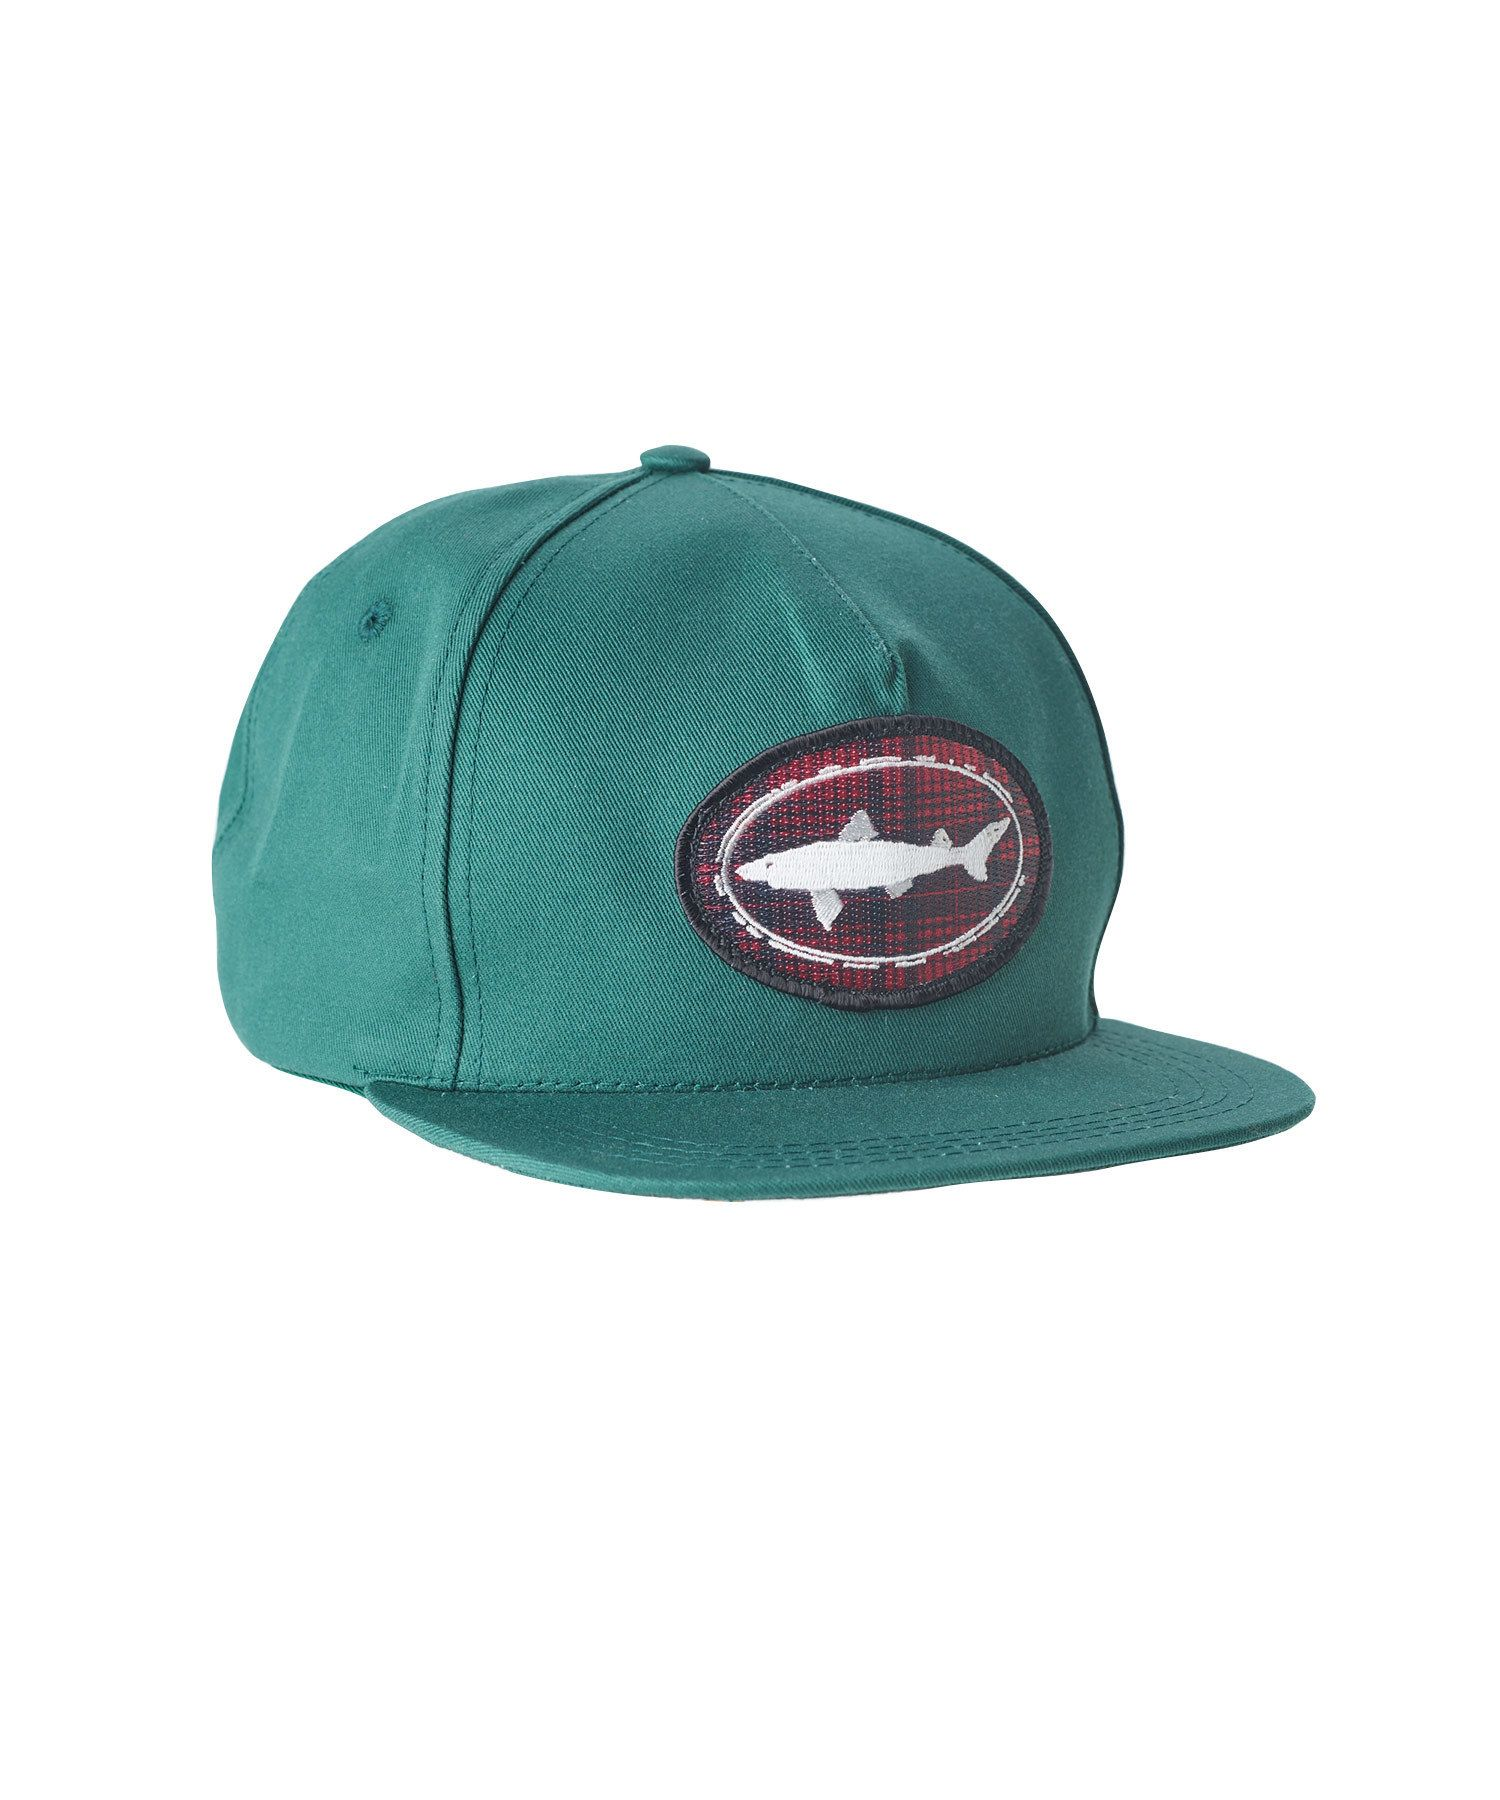 1d7ebac936519 Woolrich X Dogfish Ball Cap Hat Ball Caps